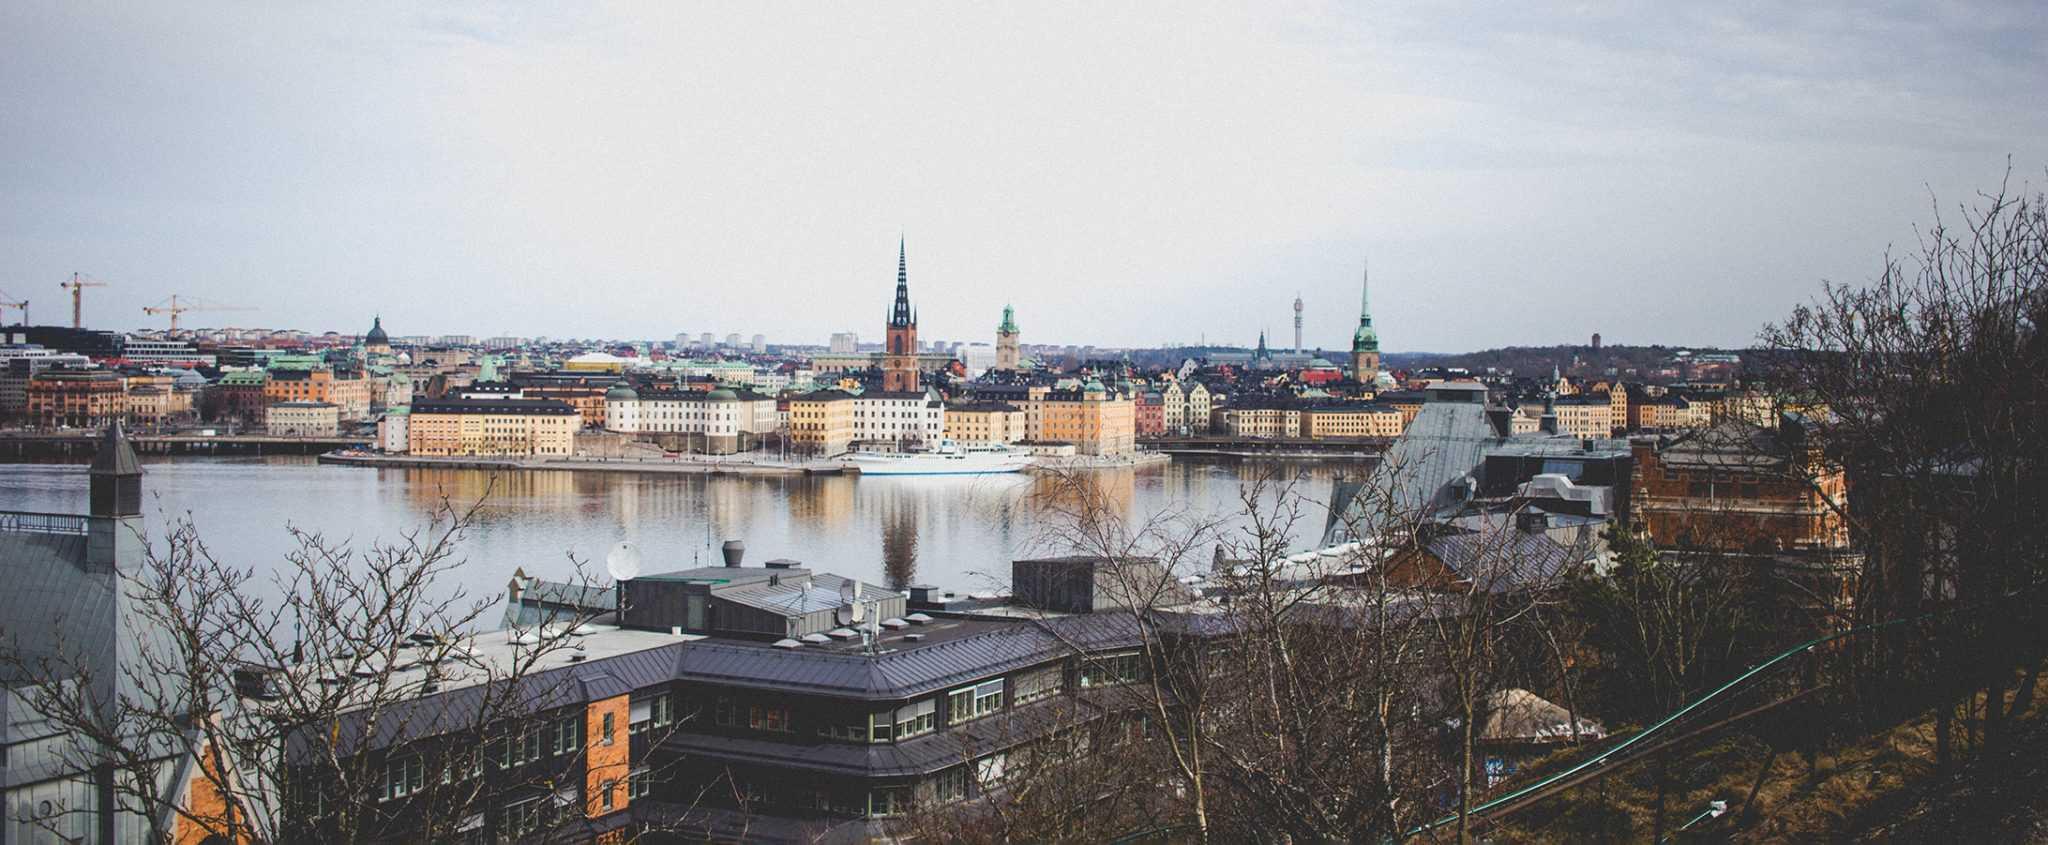 Stockholms stads framkomlighets strategi image.